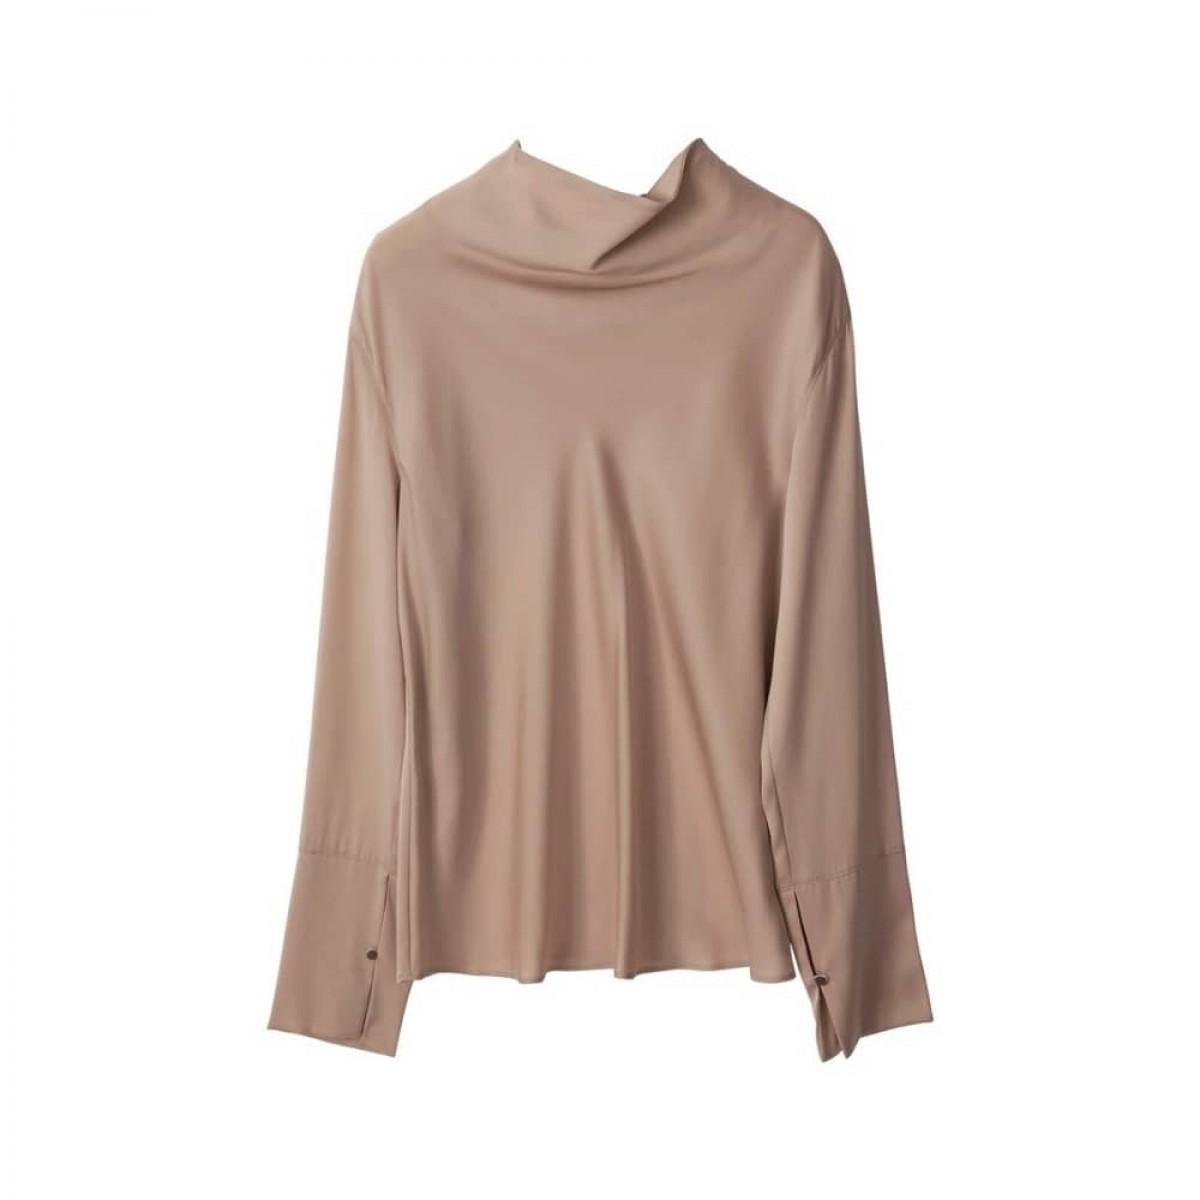 ayumi bluse - sand - front